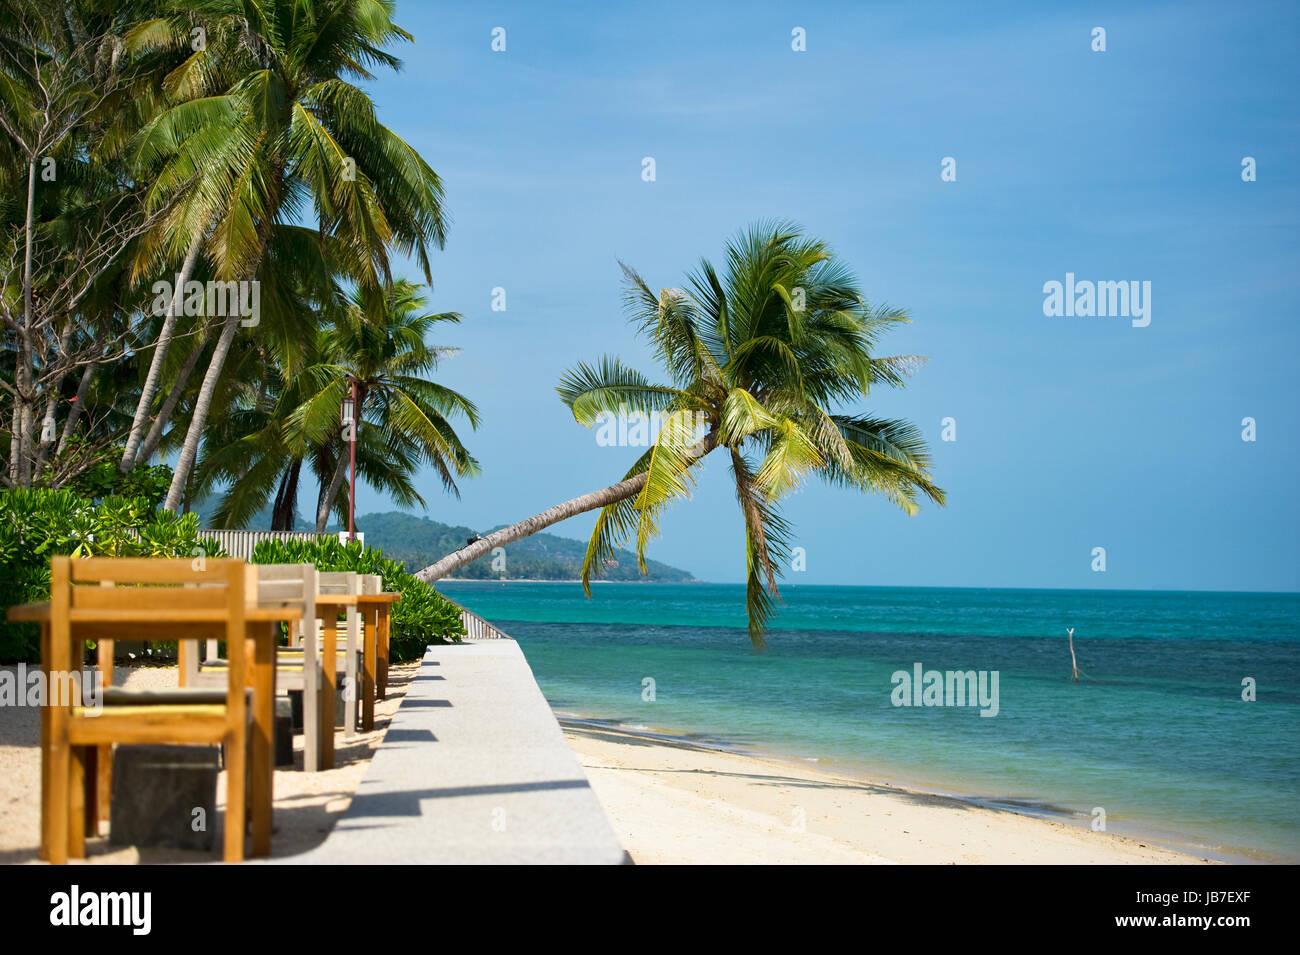 Restaurant on the beach - Stock Image